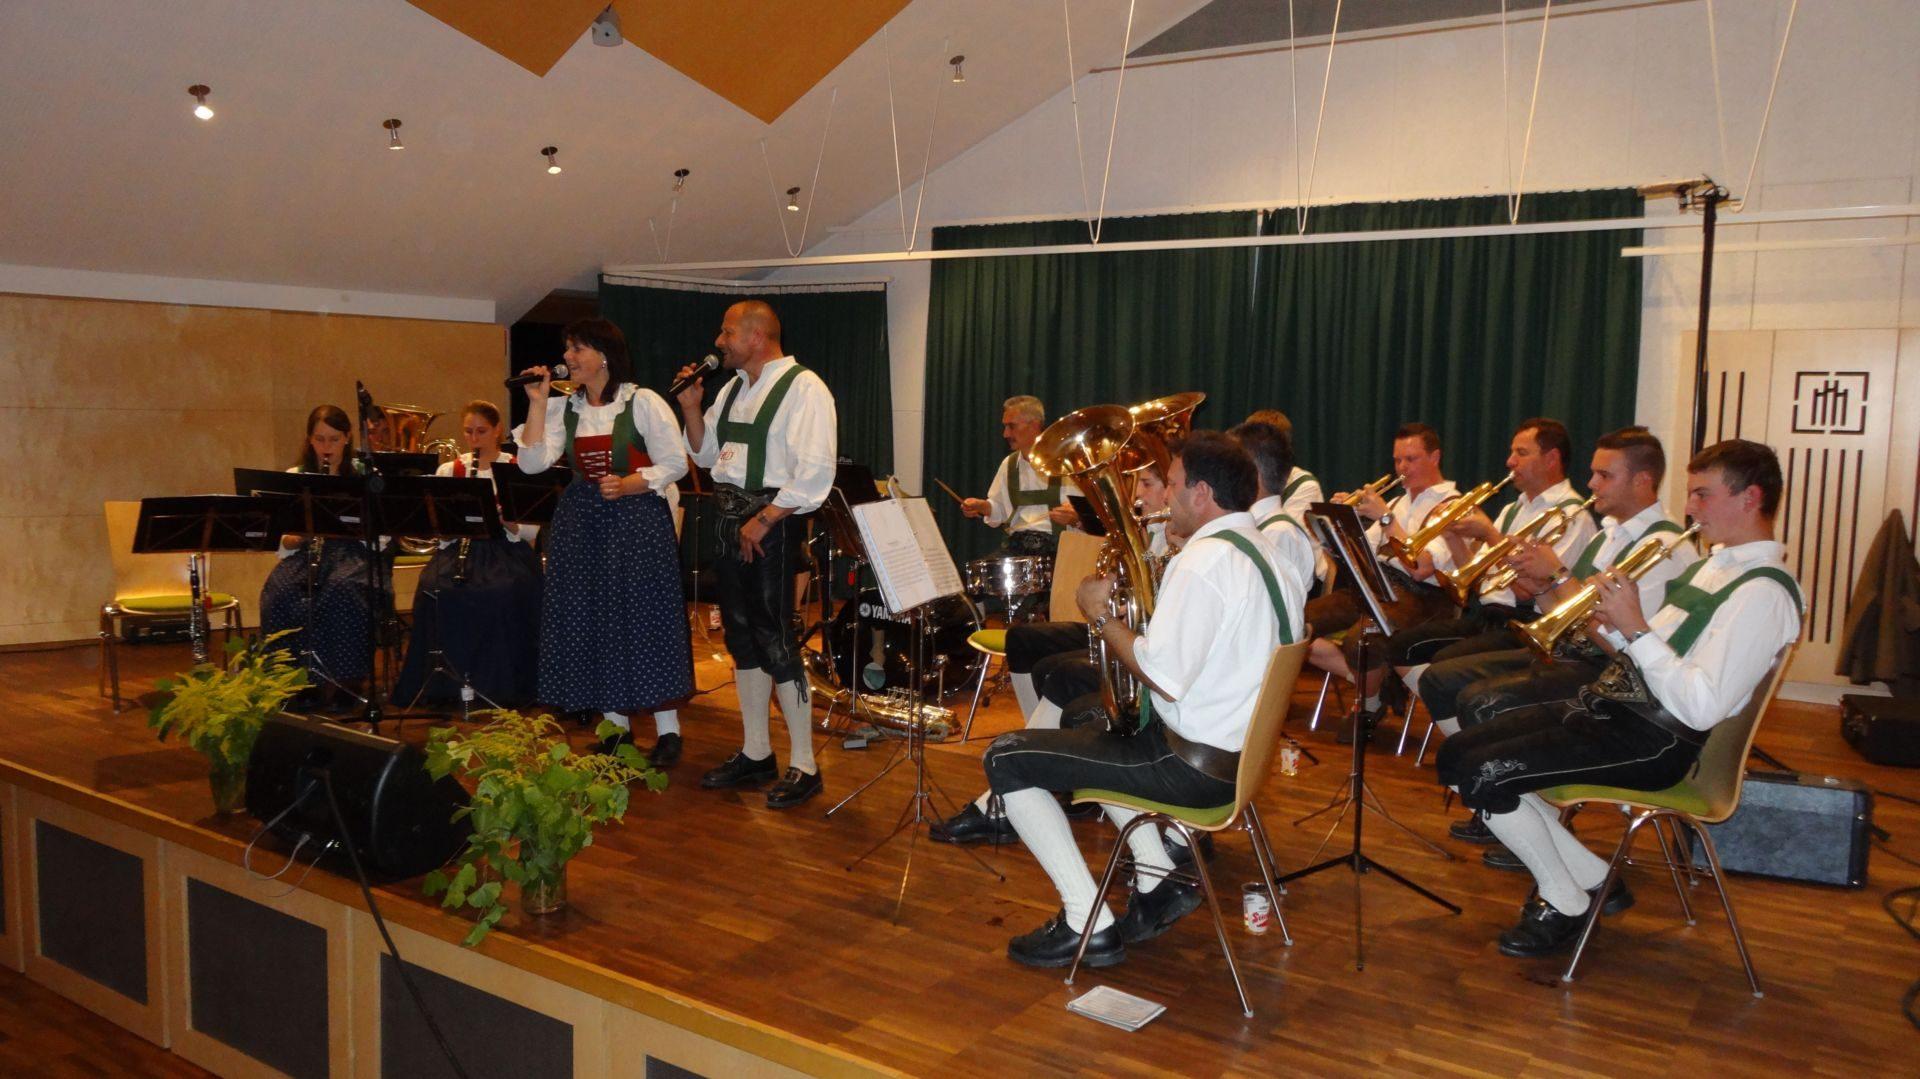 Wildermieminger Dorfmusikanten